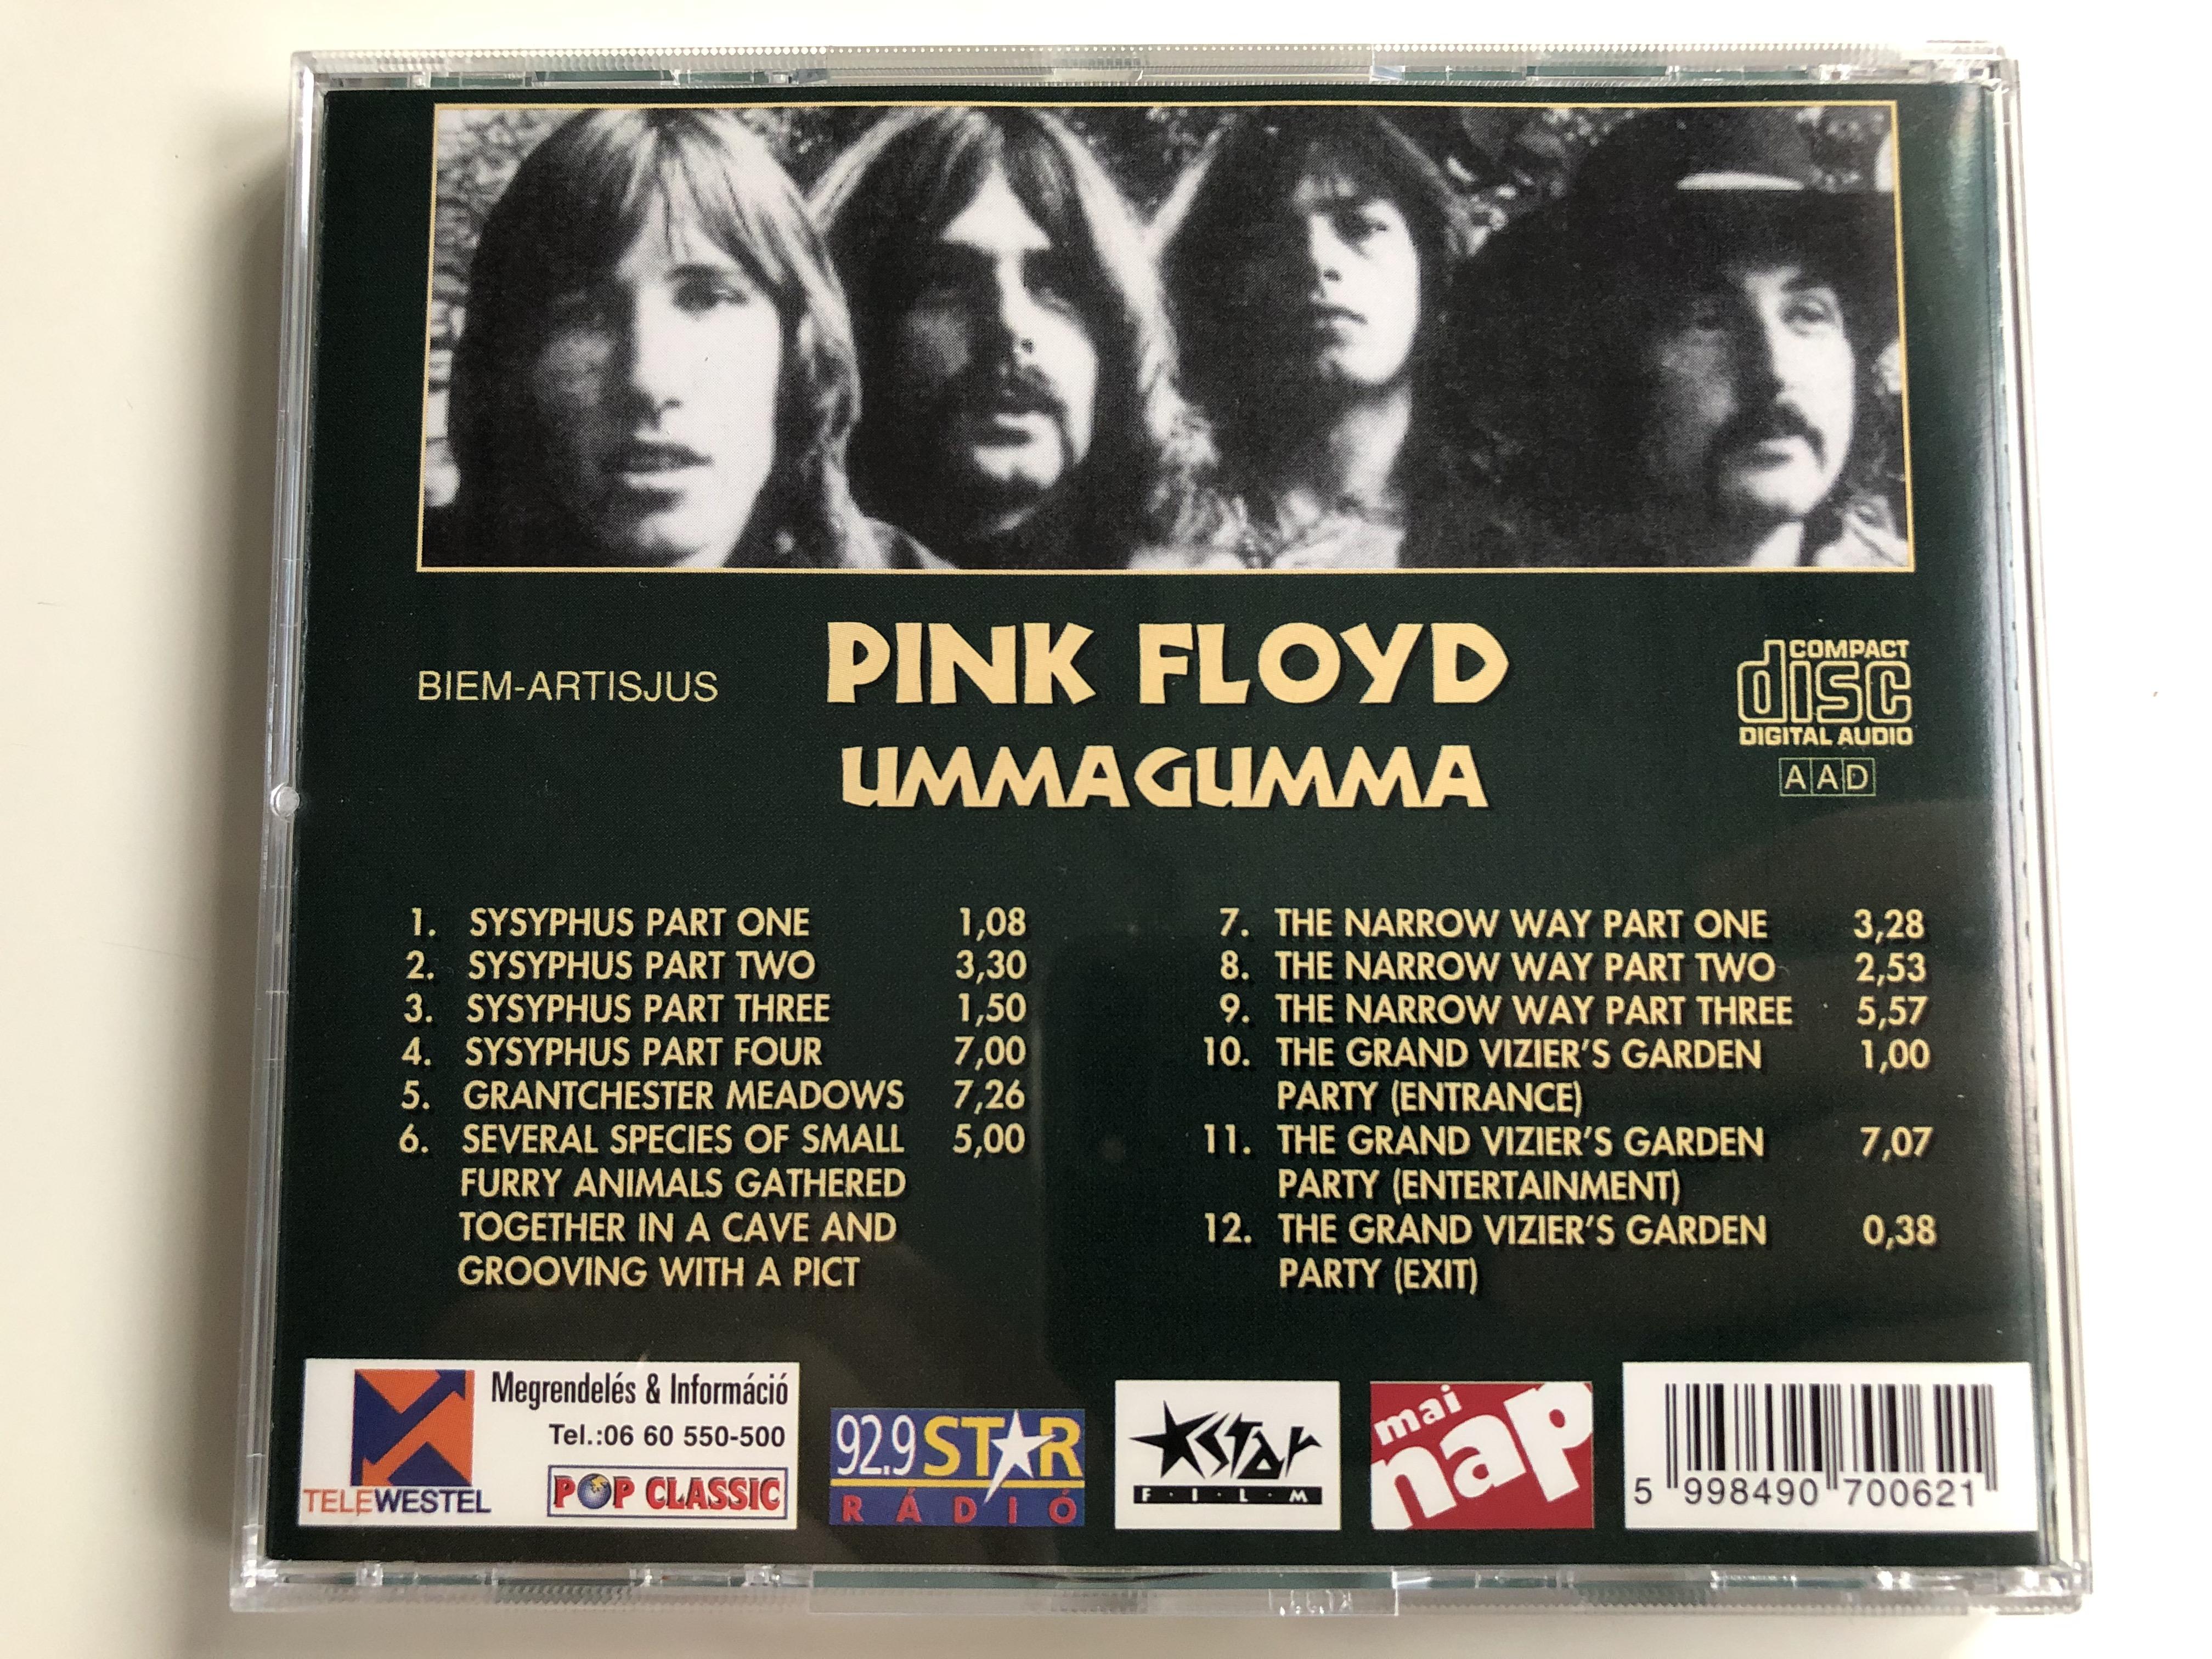 pink-floyd-ummagumma-pop-classic-euroton-audio-cd-eucd-0062-4-.jpg